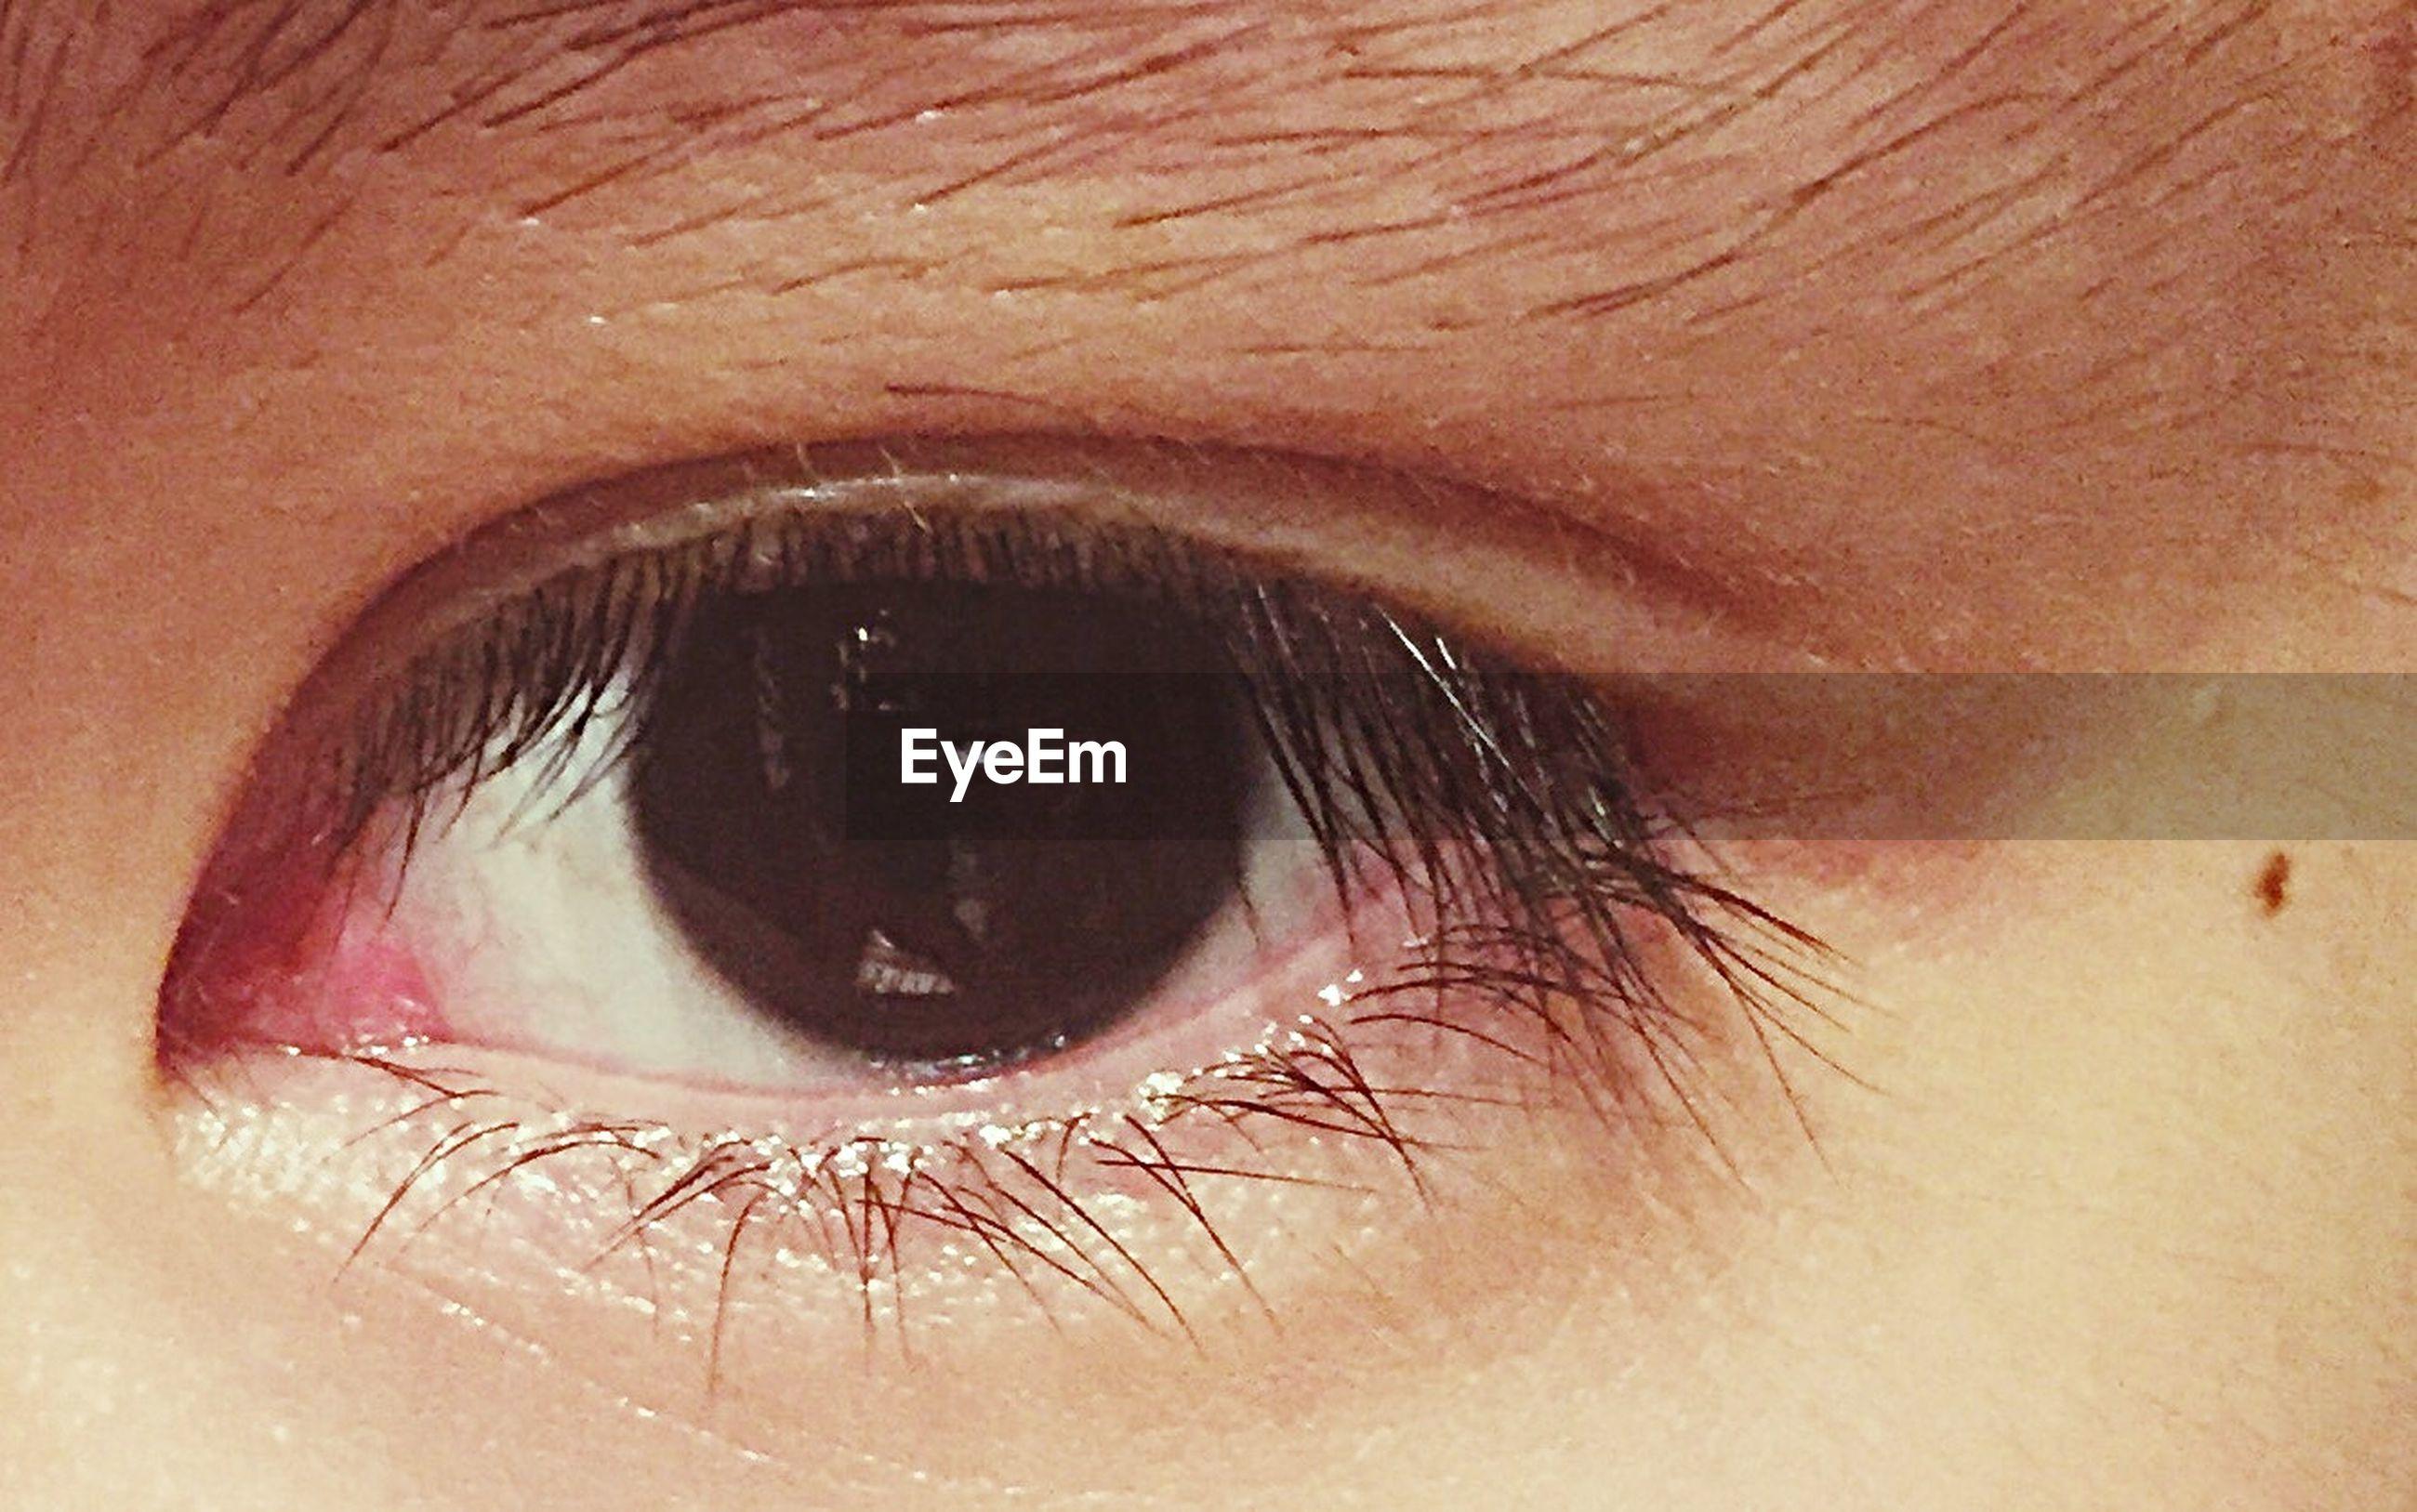 human eye, indoors, eyelash, close-up, eyesight, extreme close-up, part of, looking at camera, portrait, sensory perception, lifestyles, eyeball, human skin, human face, iris - eye, unrecognizable person, extreme close up